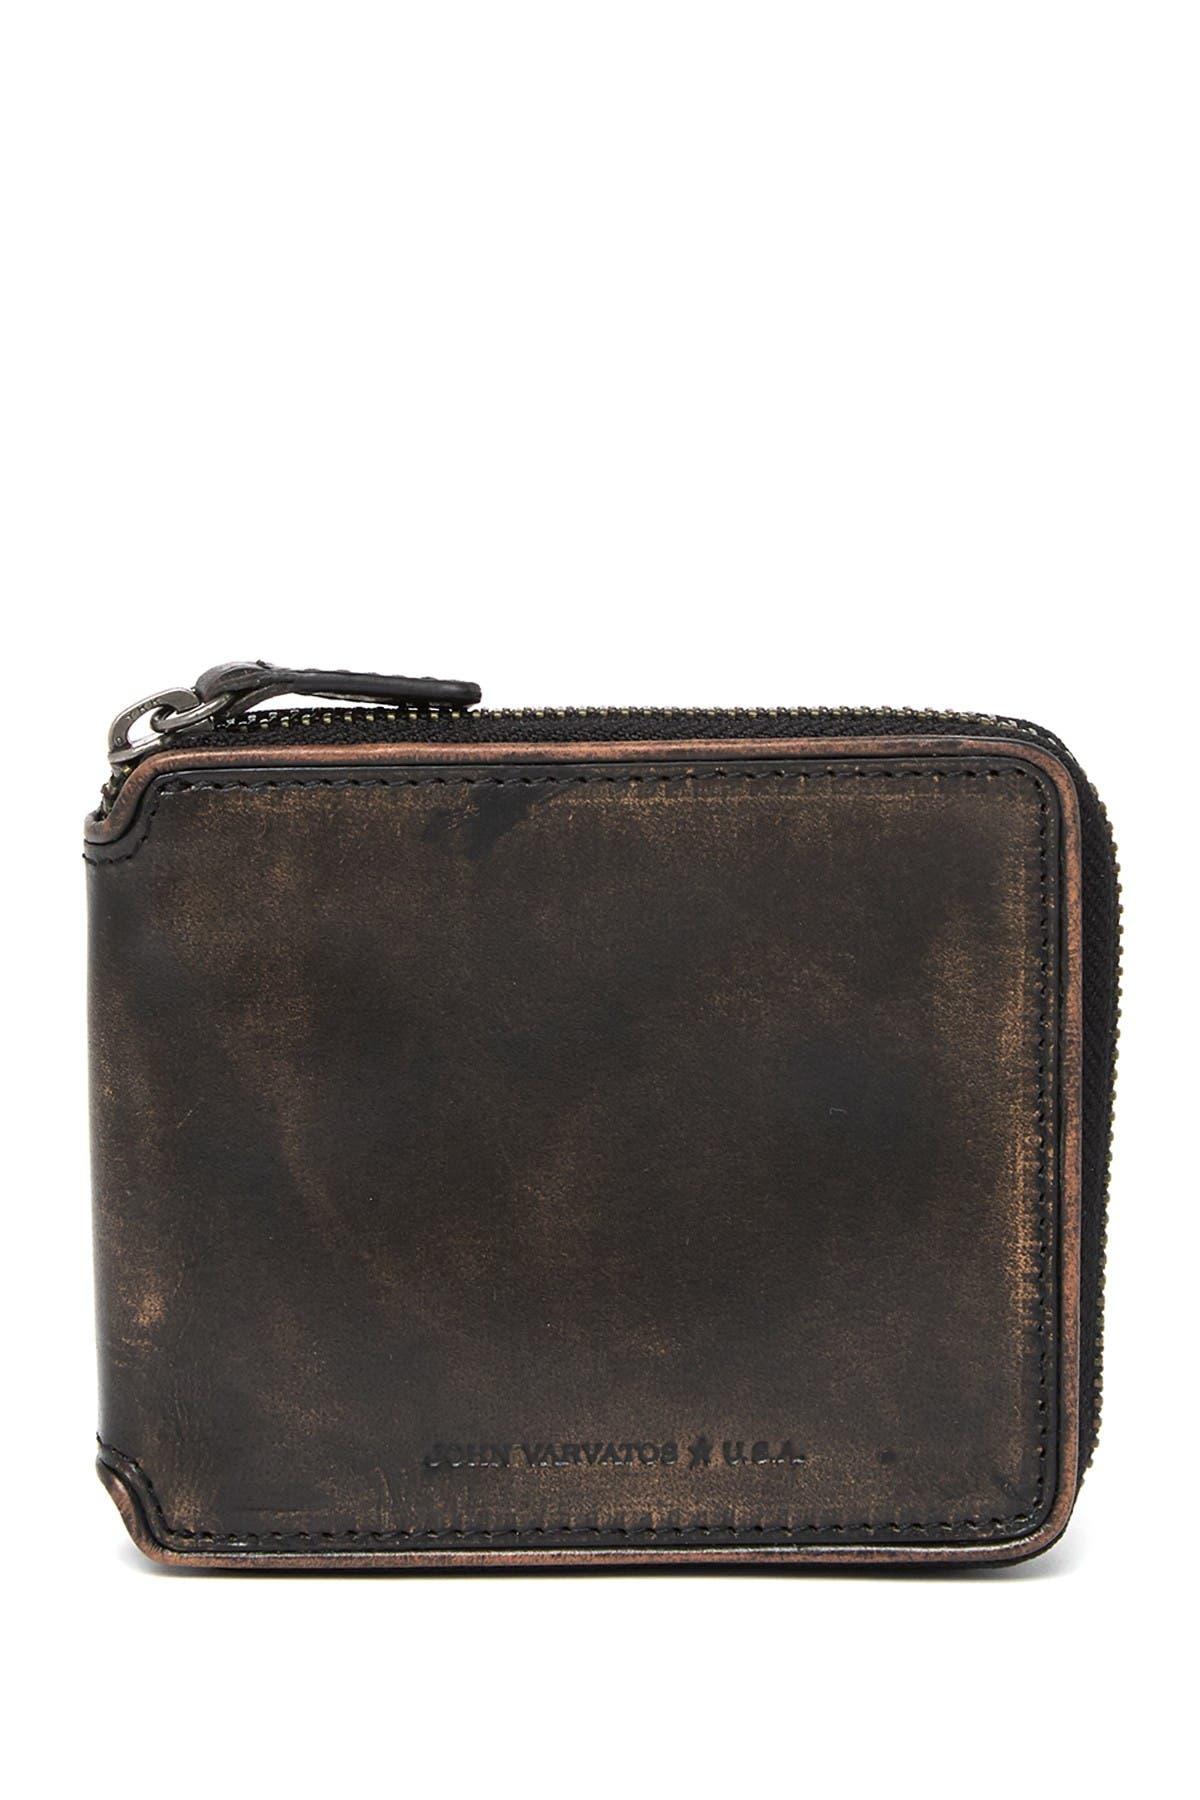 Image of John Varvatos Collection Leather Zip Around Wallet